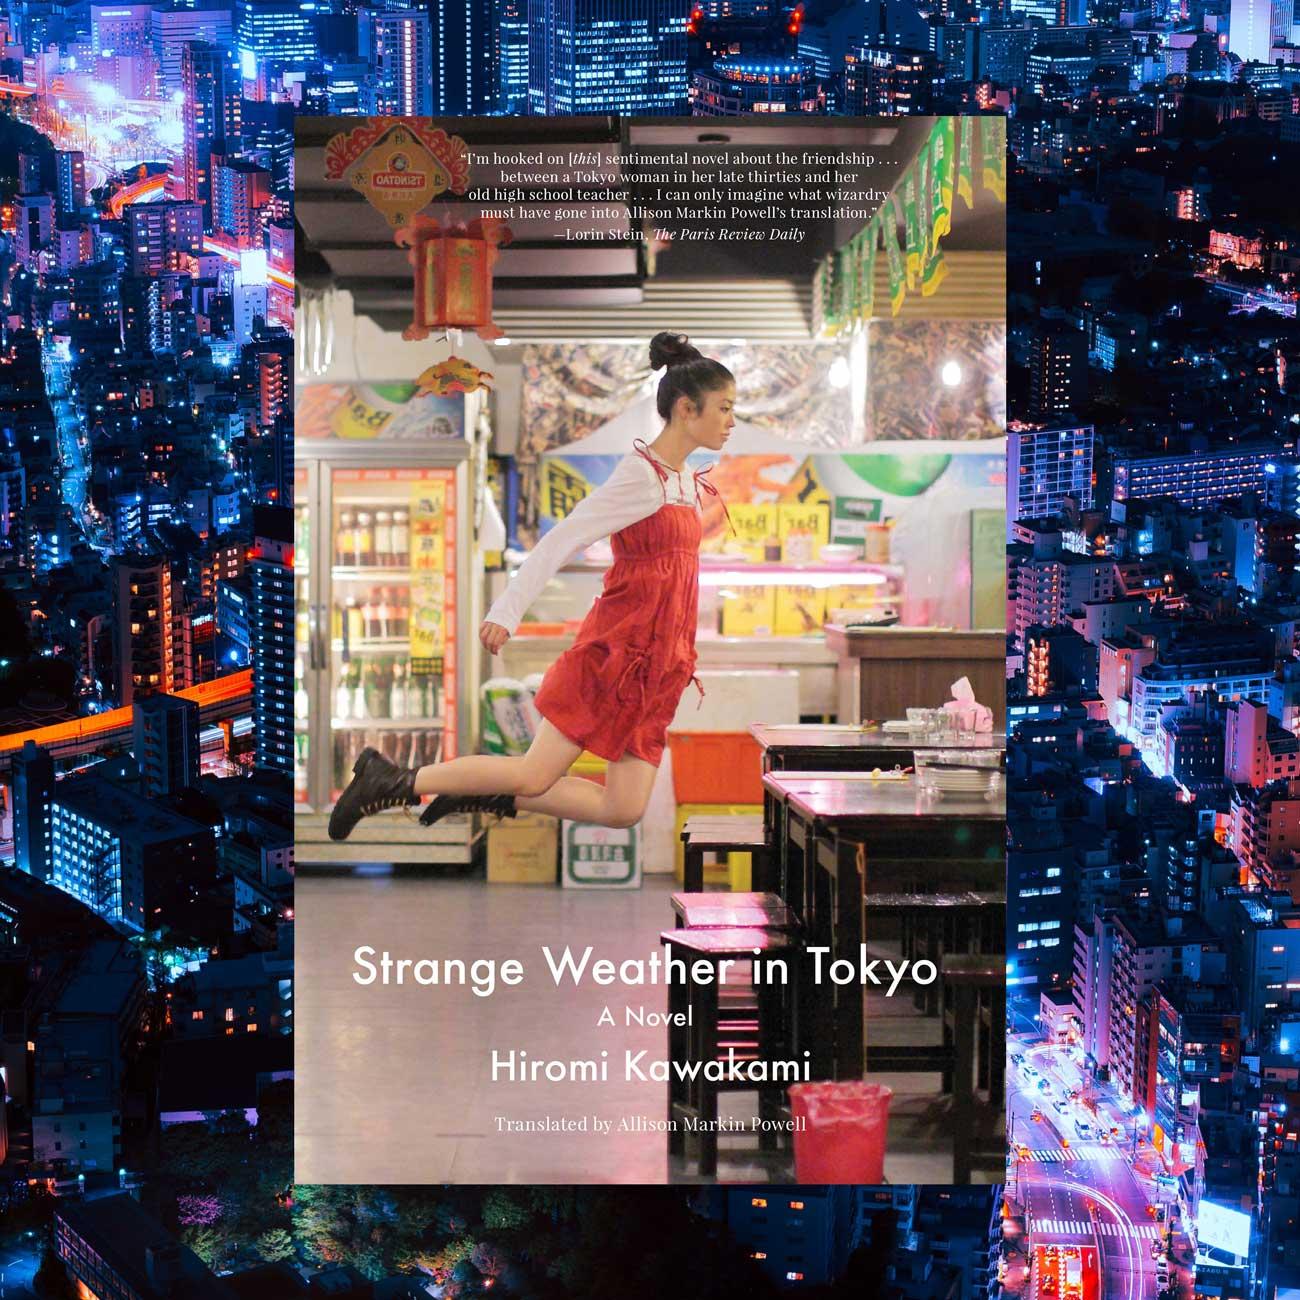 Strange Weather in Tokyo by Hiromi Kawakami